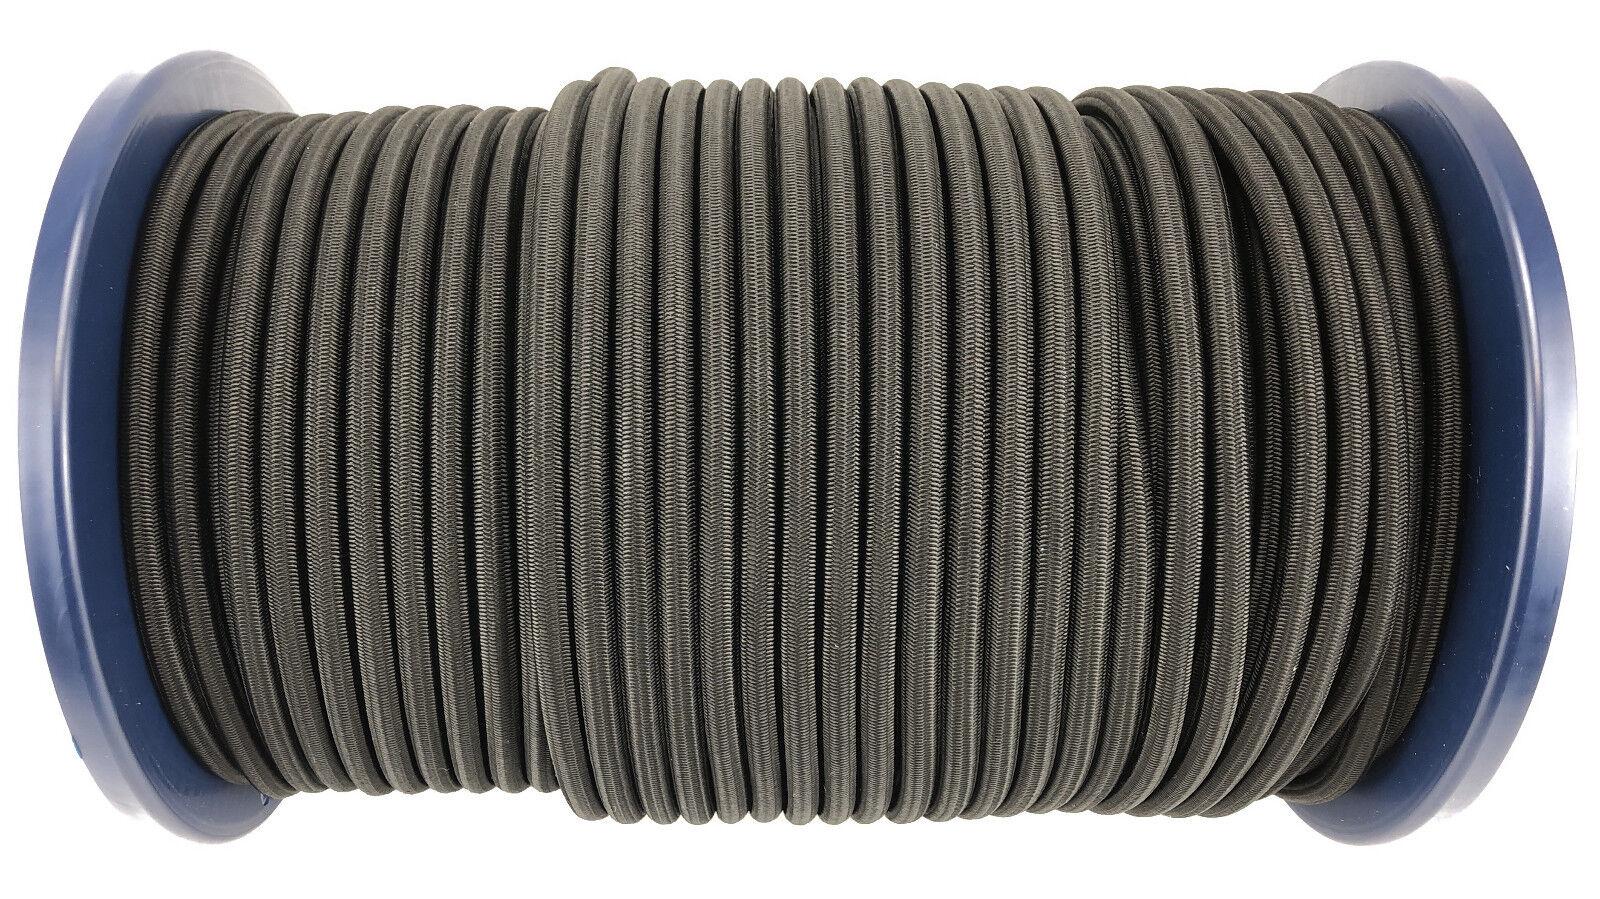 12 mm schwarz elastisches Gummi seil. seil. Gummi Gummiseil festbinden x 25 metres 924ac2